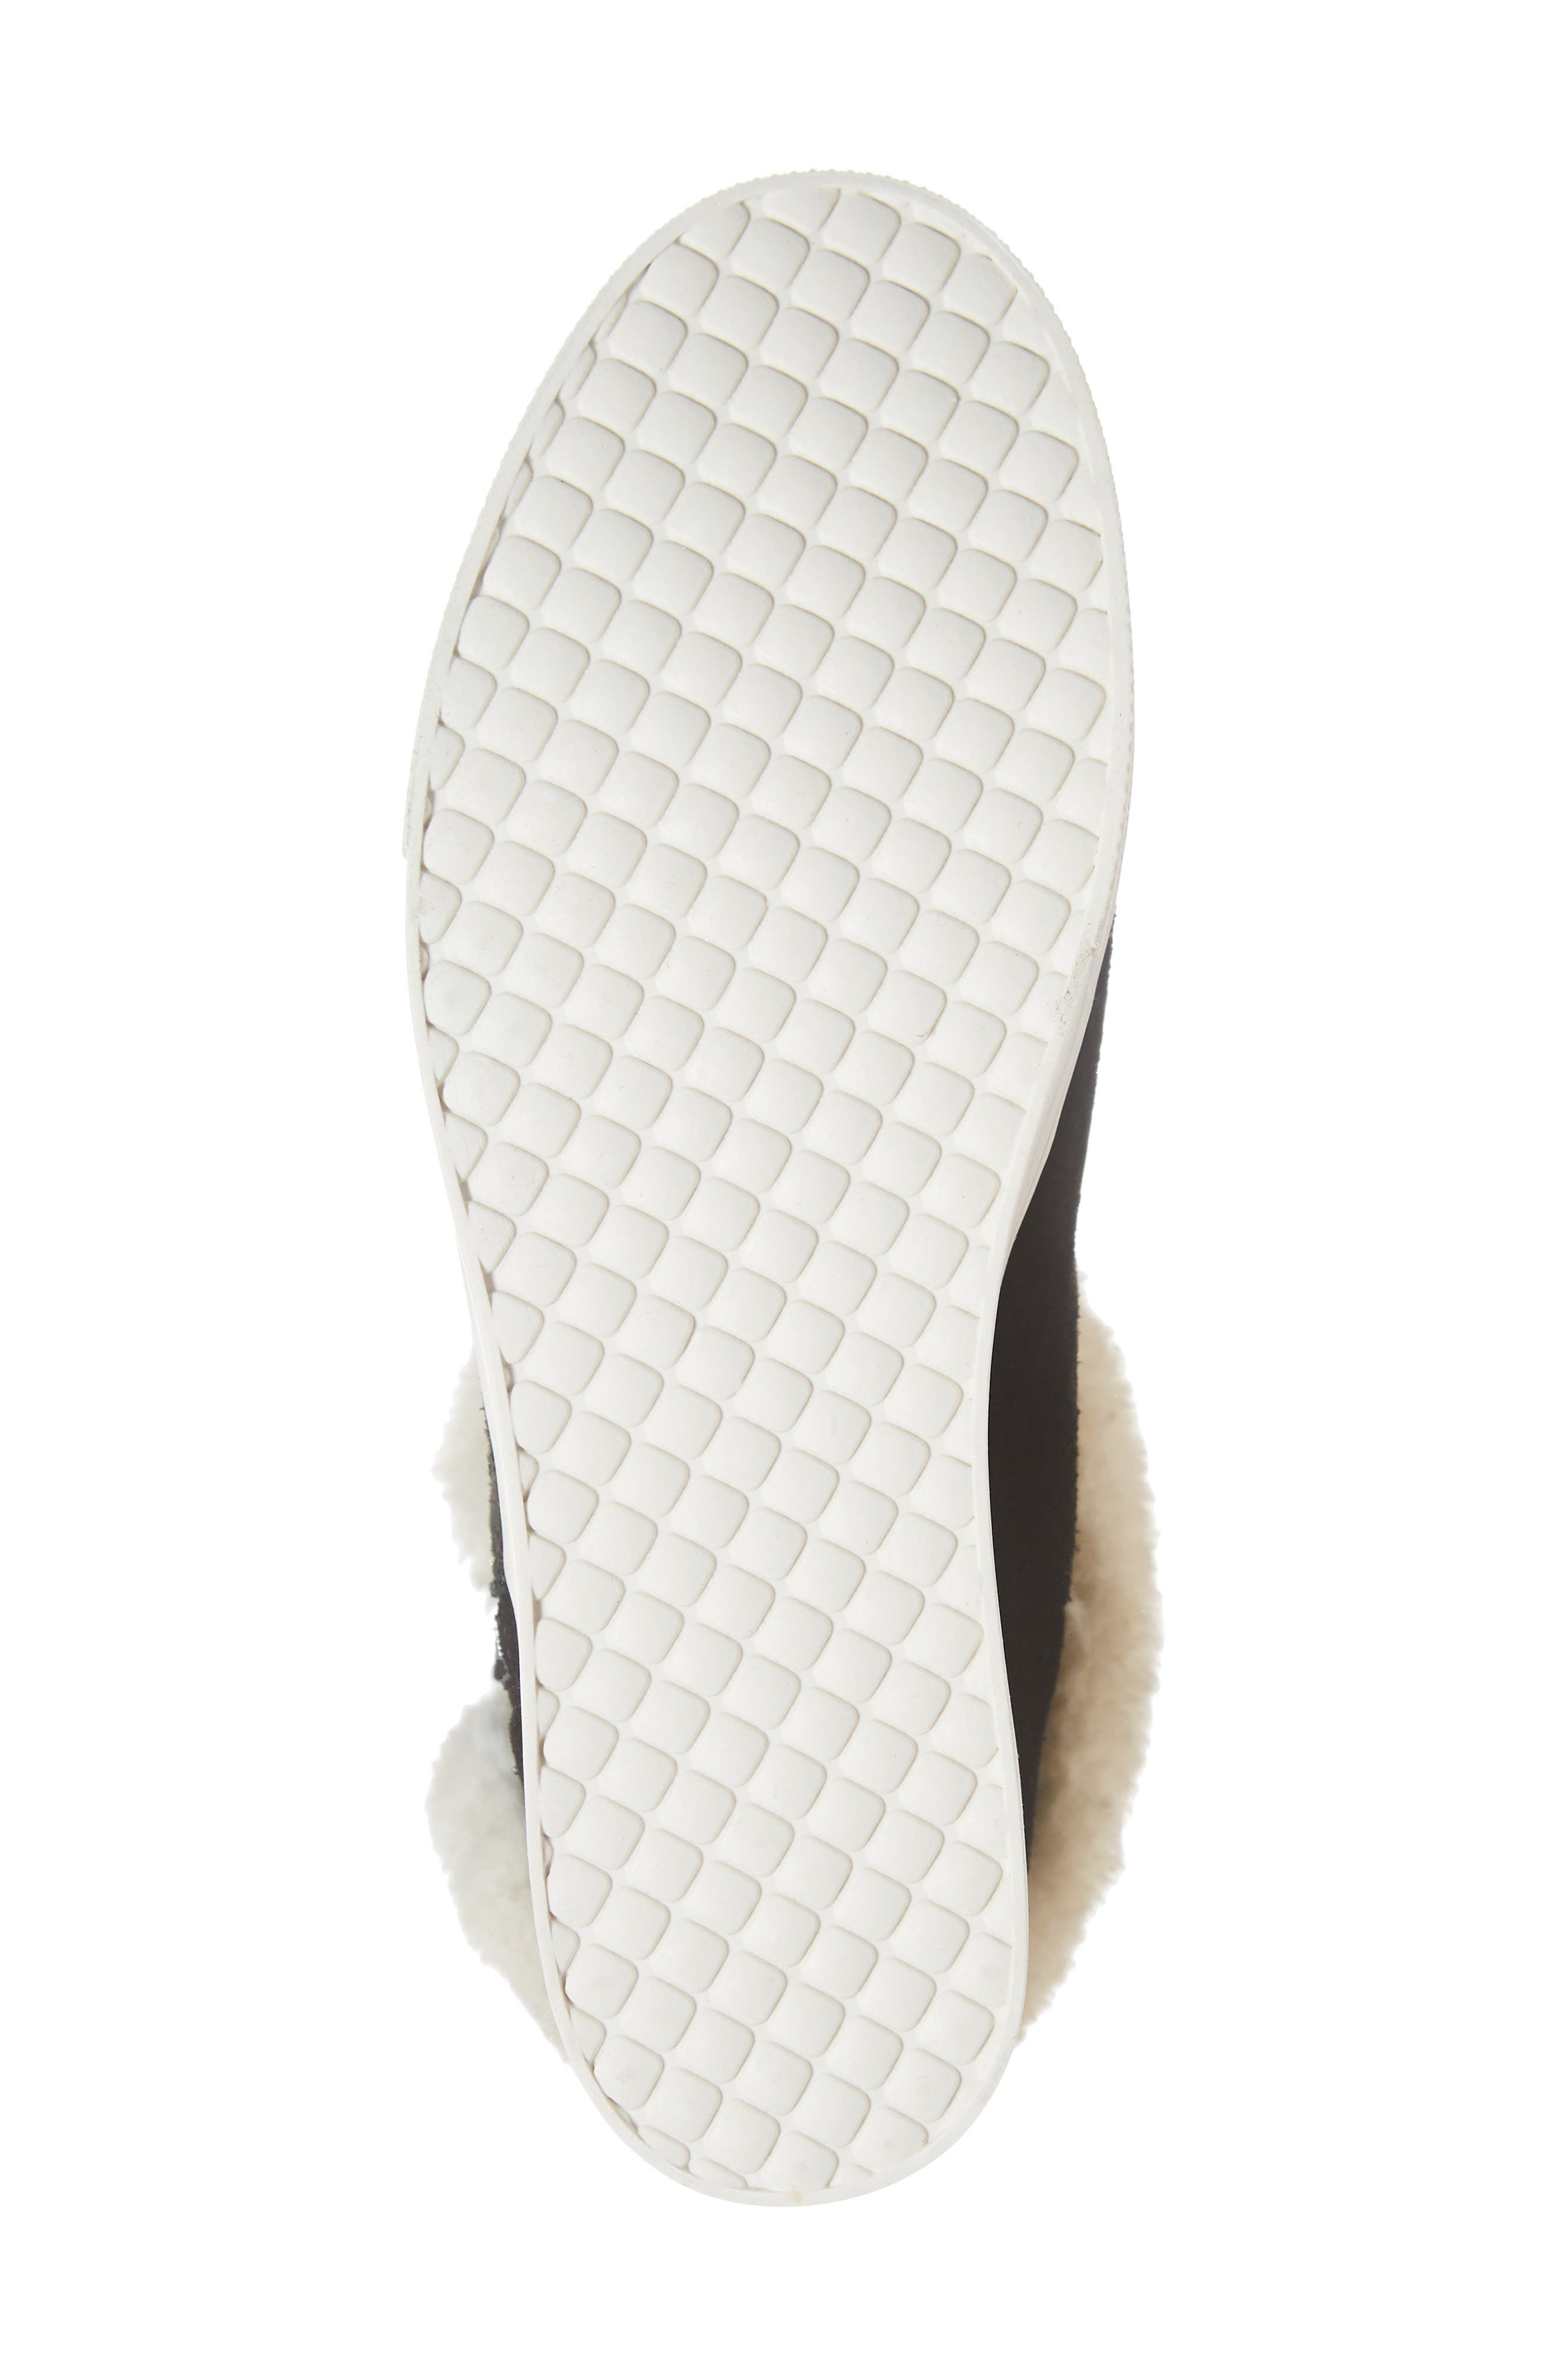 STEVE MADDEN,                             Faux Fur Lined Sneaker,                             Alternate thumbnail 6, color,                             006